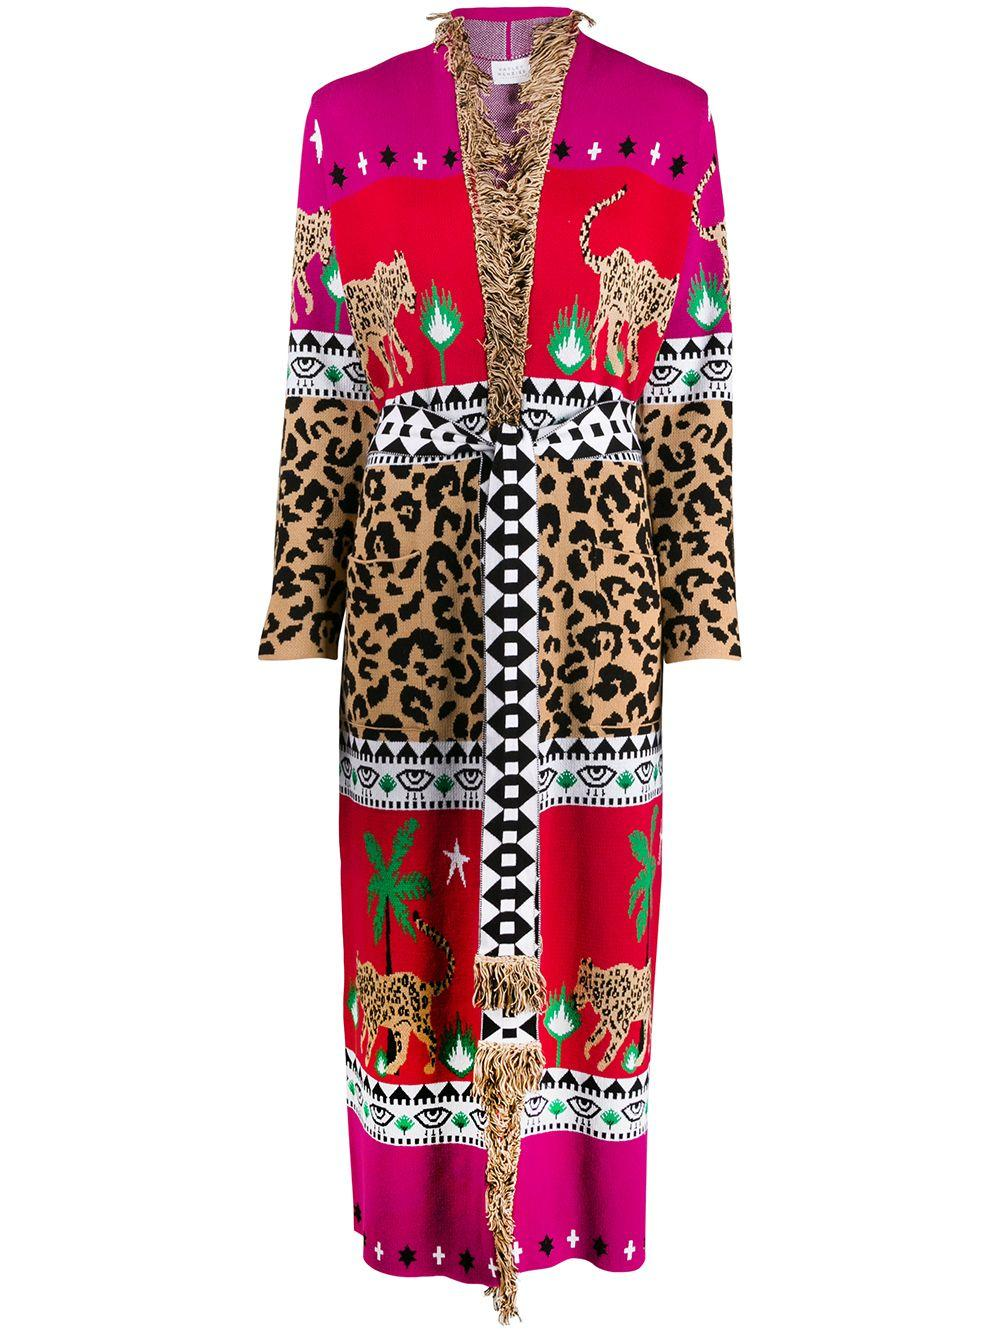 Leopar Dress Duster Item # 19-030101-025